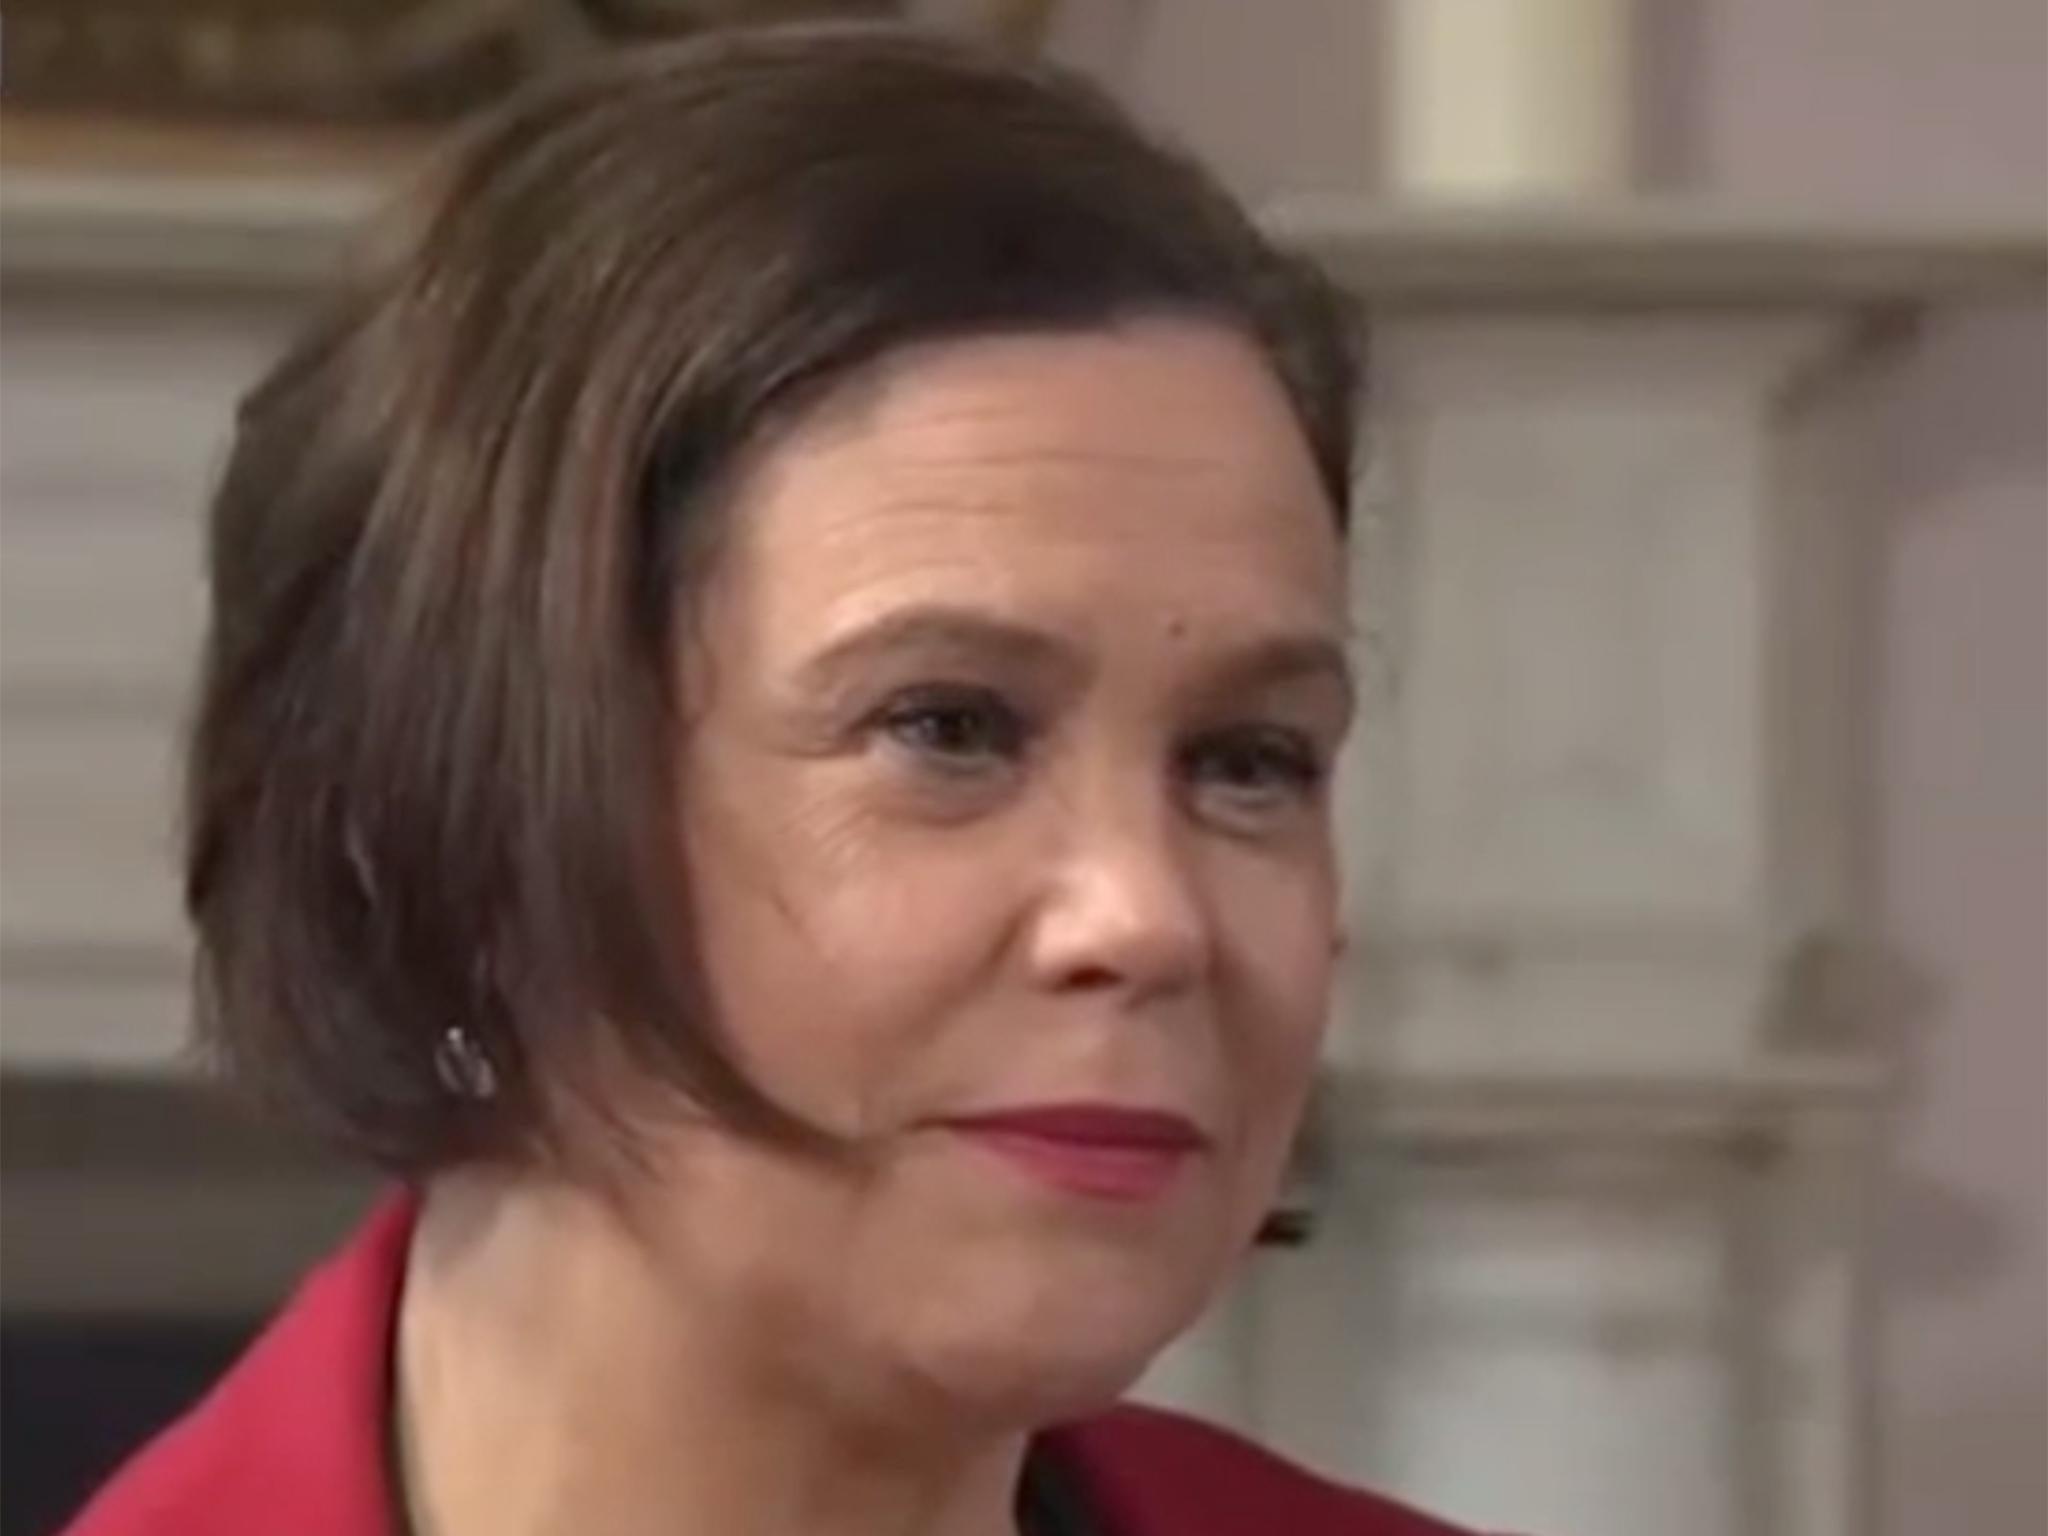 New Sinn Fein leader Mary Lou McDonald calls Irish Prime Minister Leo Varadkar 'smarmy'